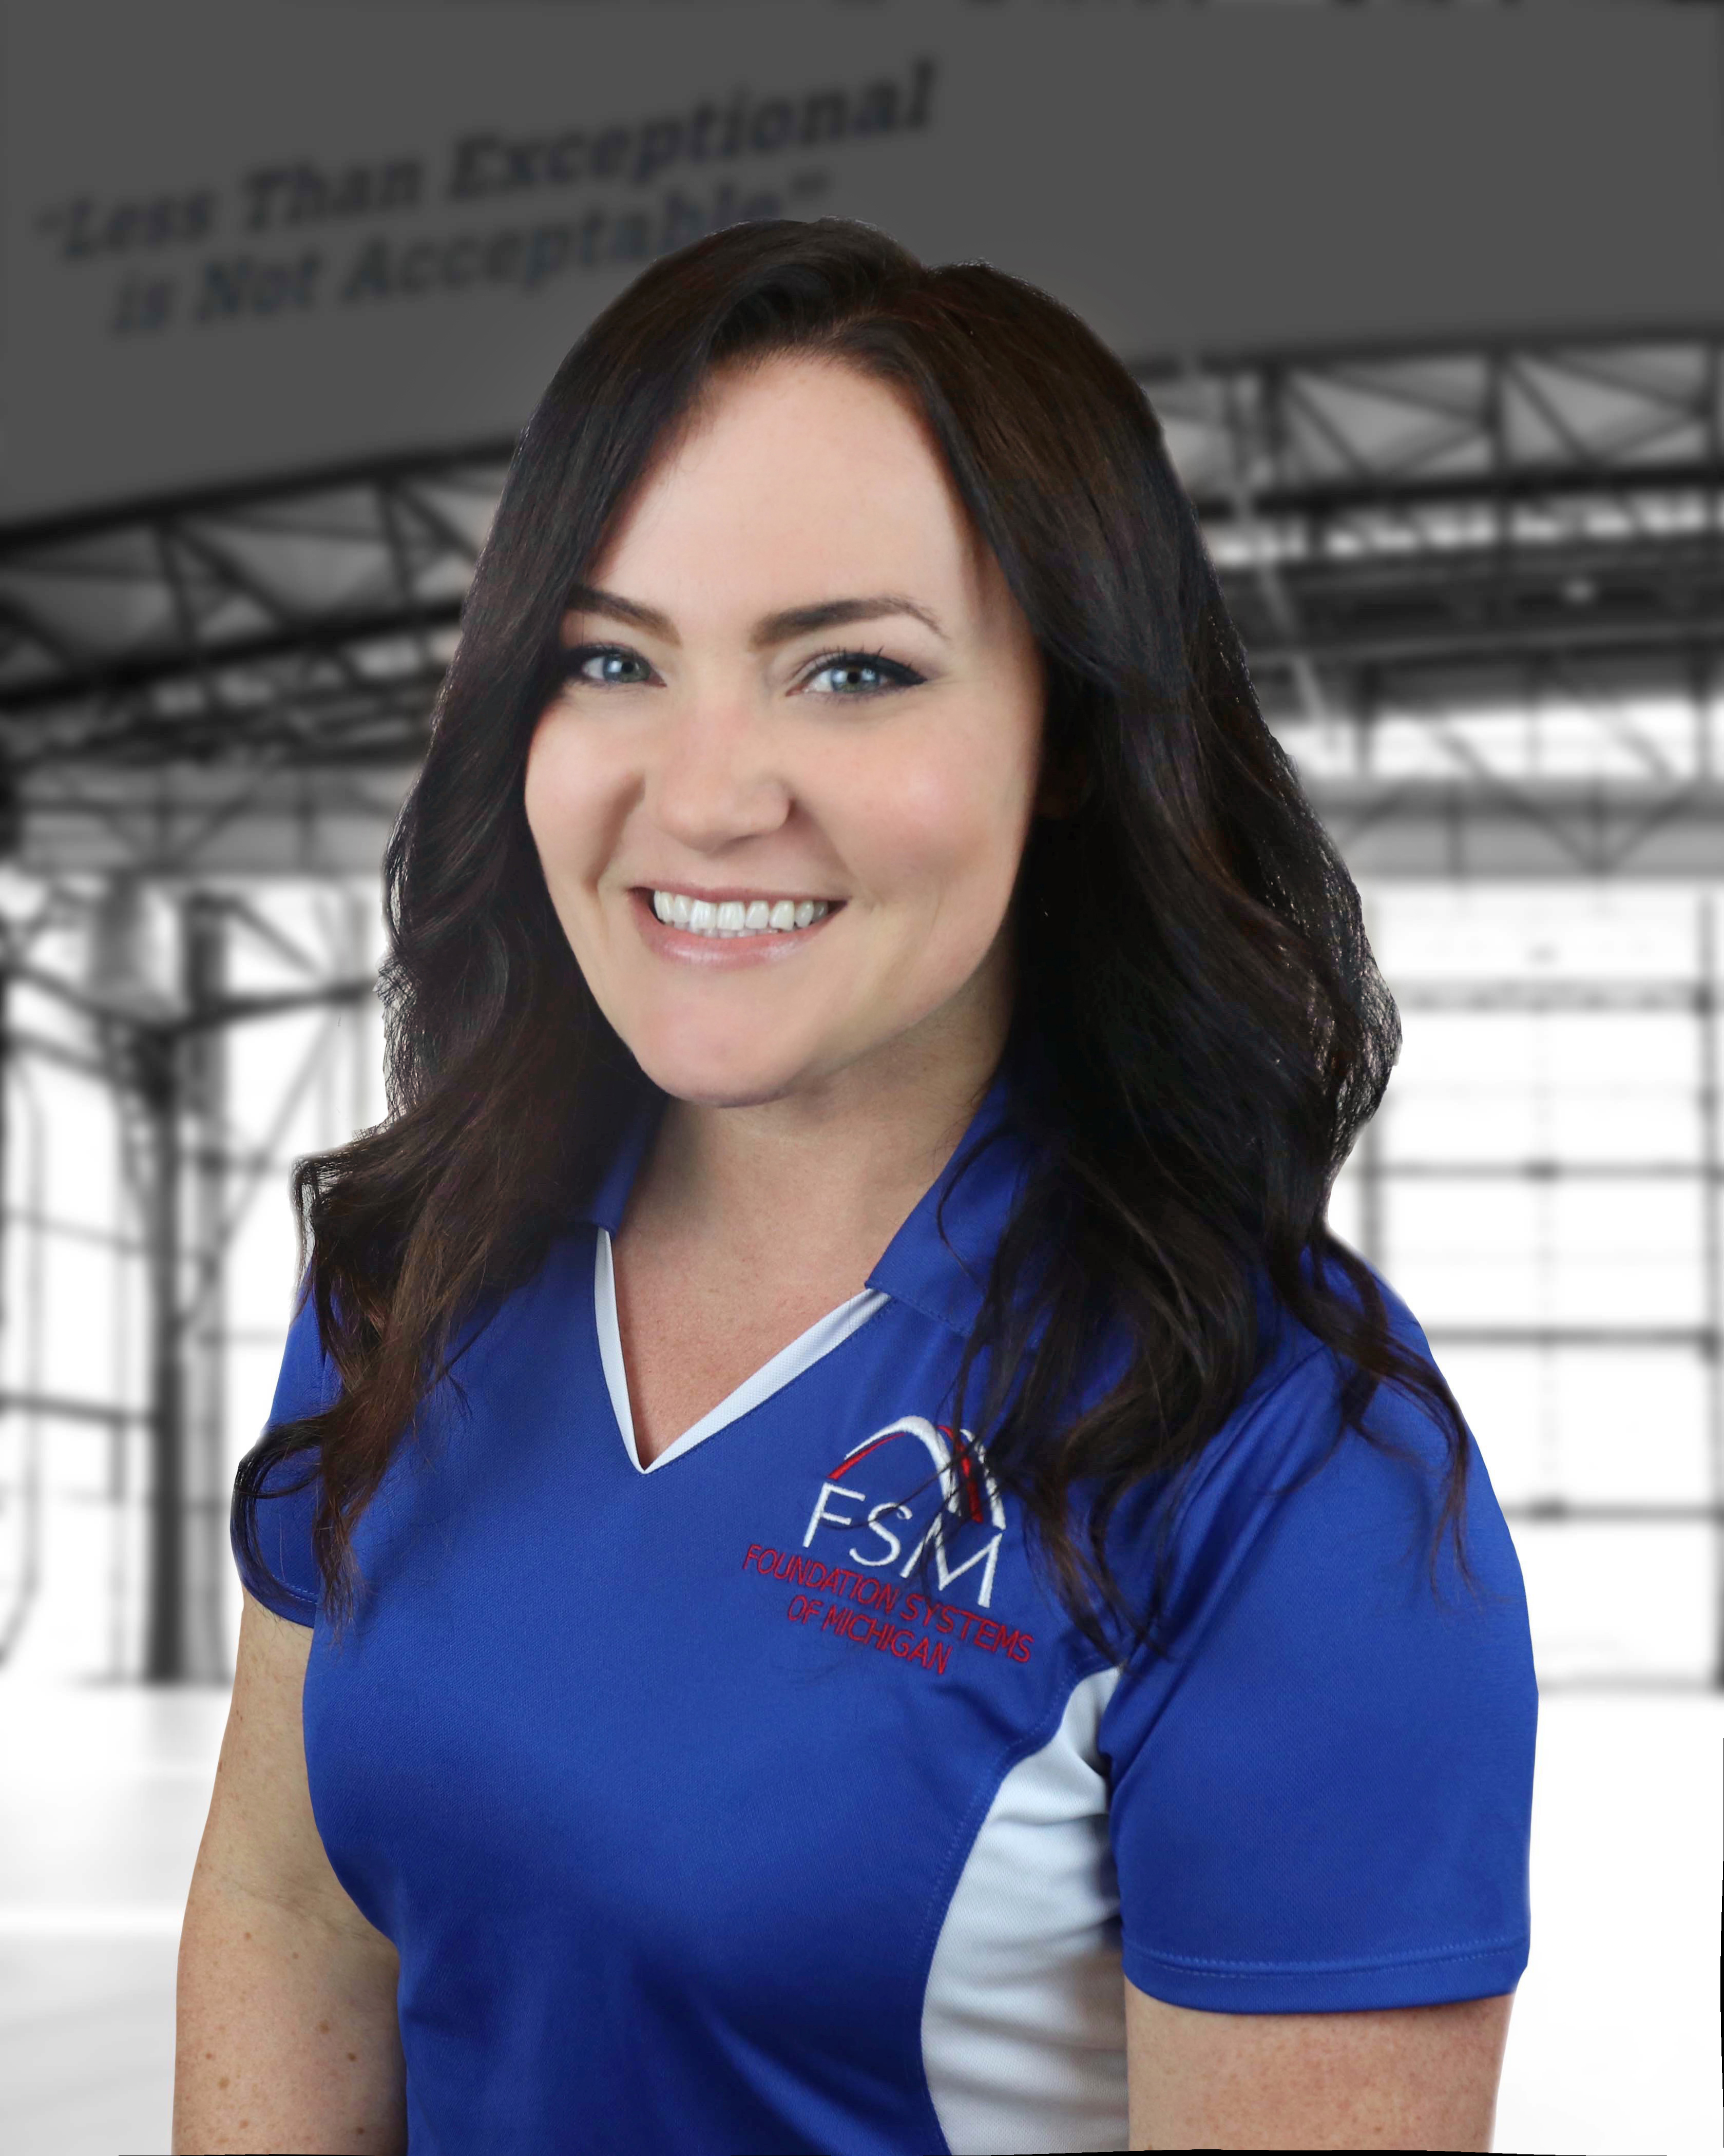 FSM Andrea Broecker Marketing Associate